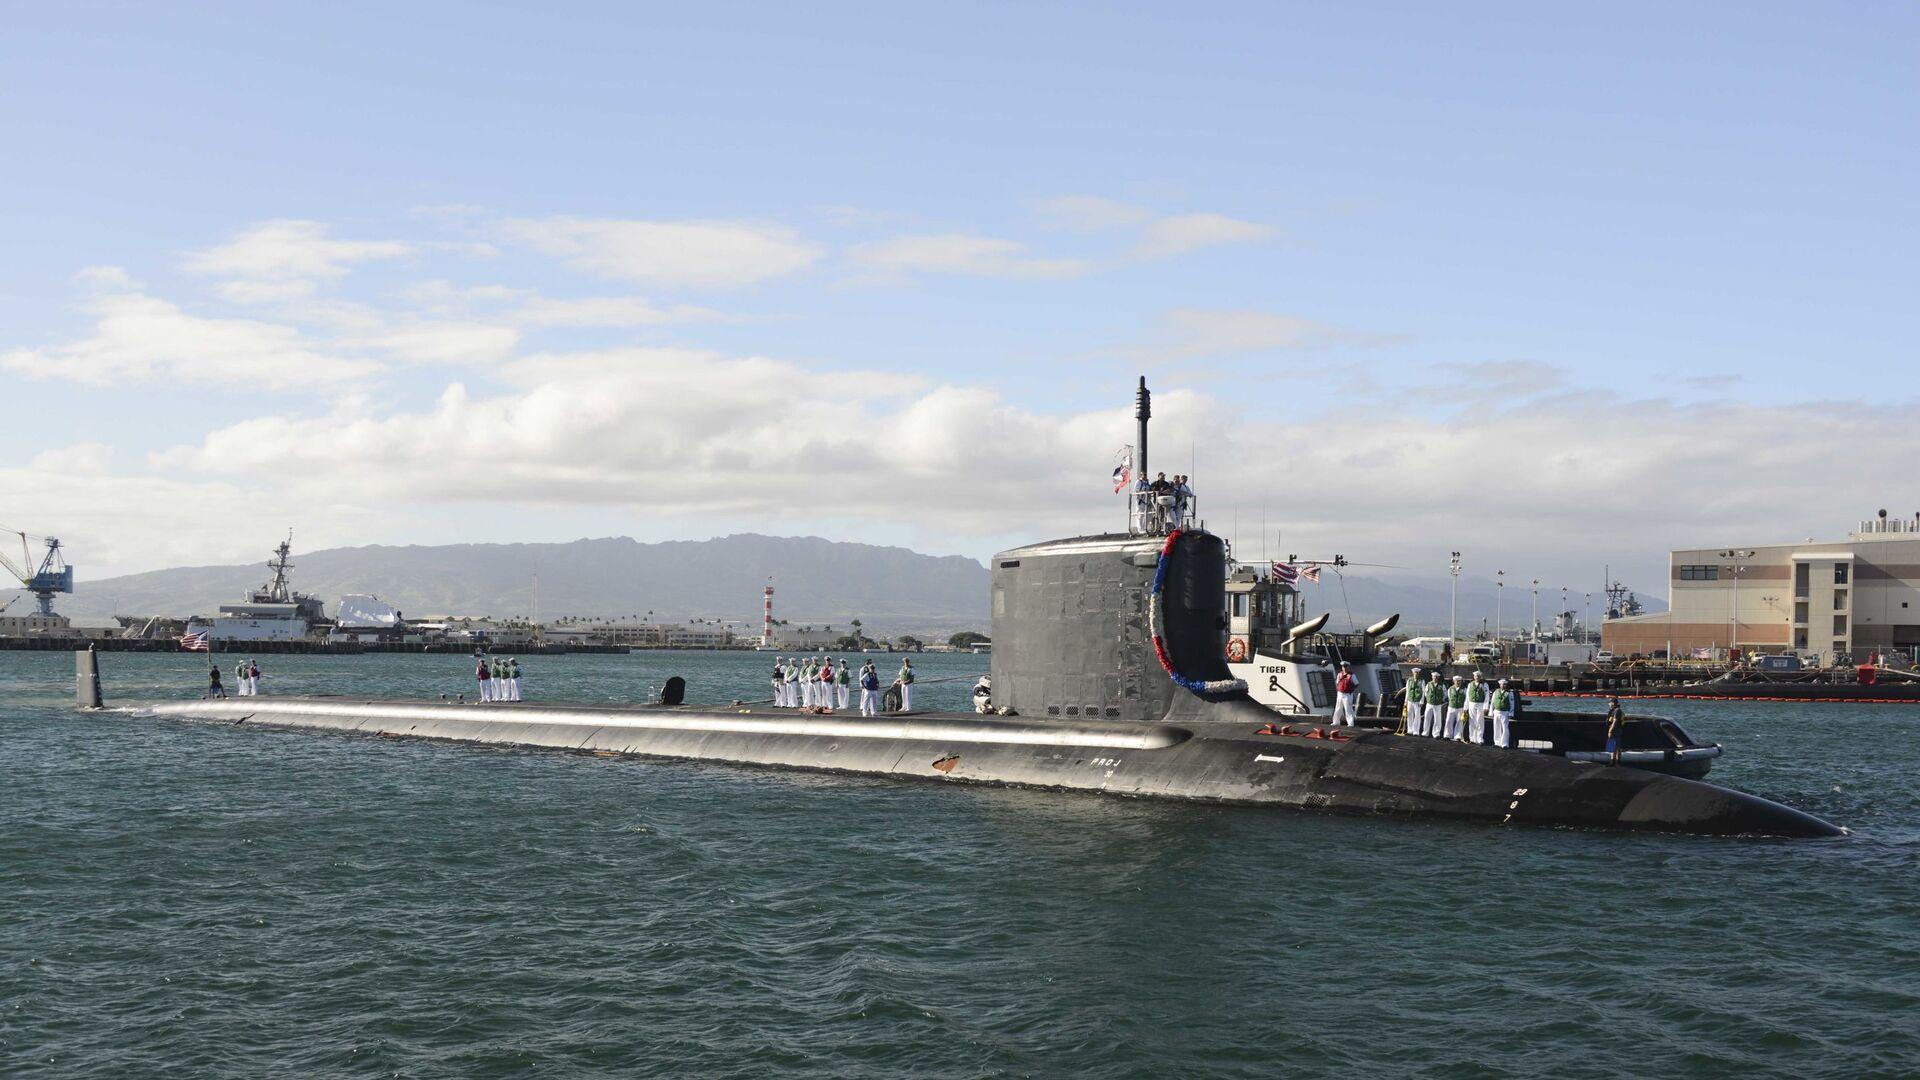 Sottomarino nucleare USA Mississippi - Sputnik Italia, 1920, 21.09.2021